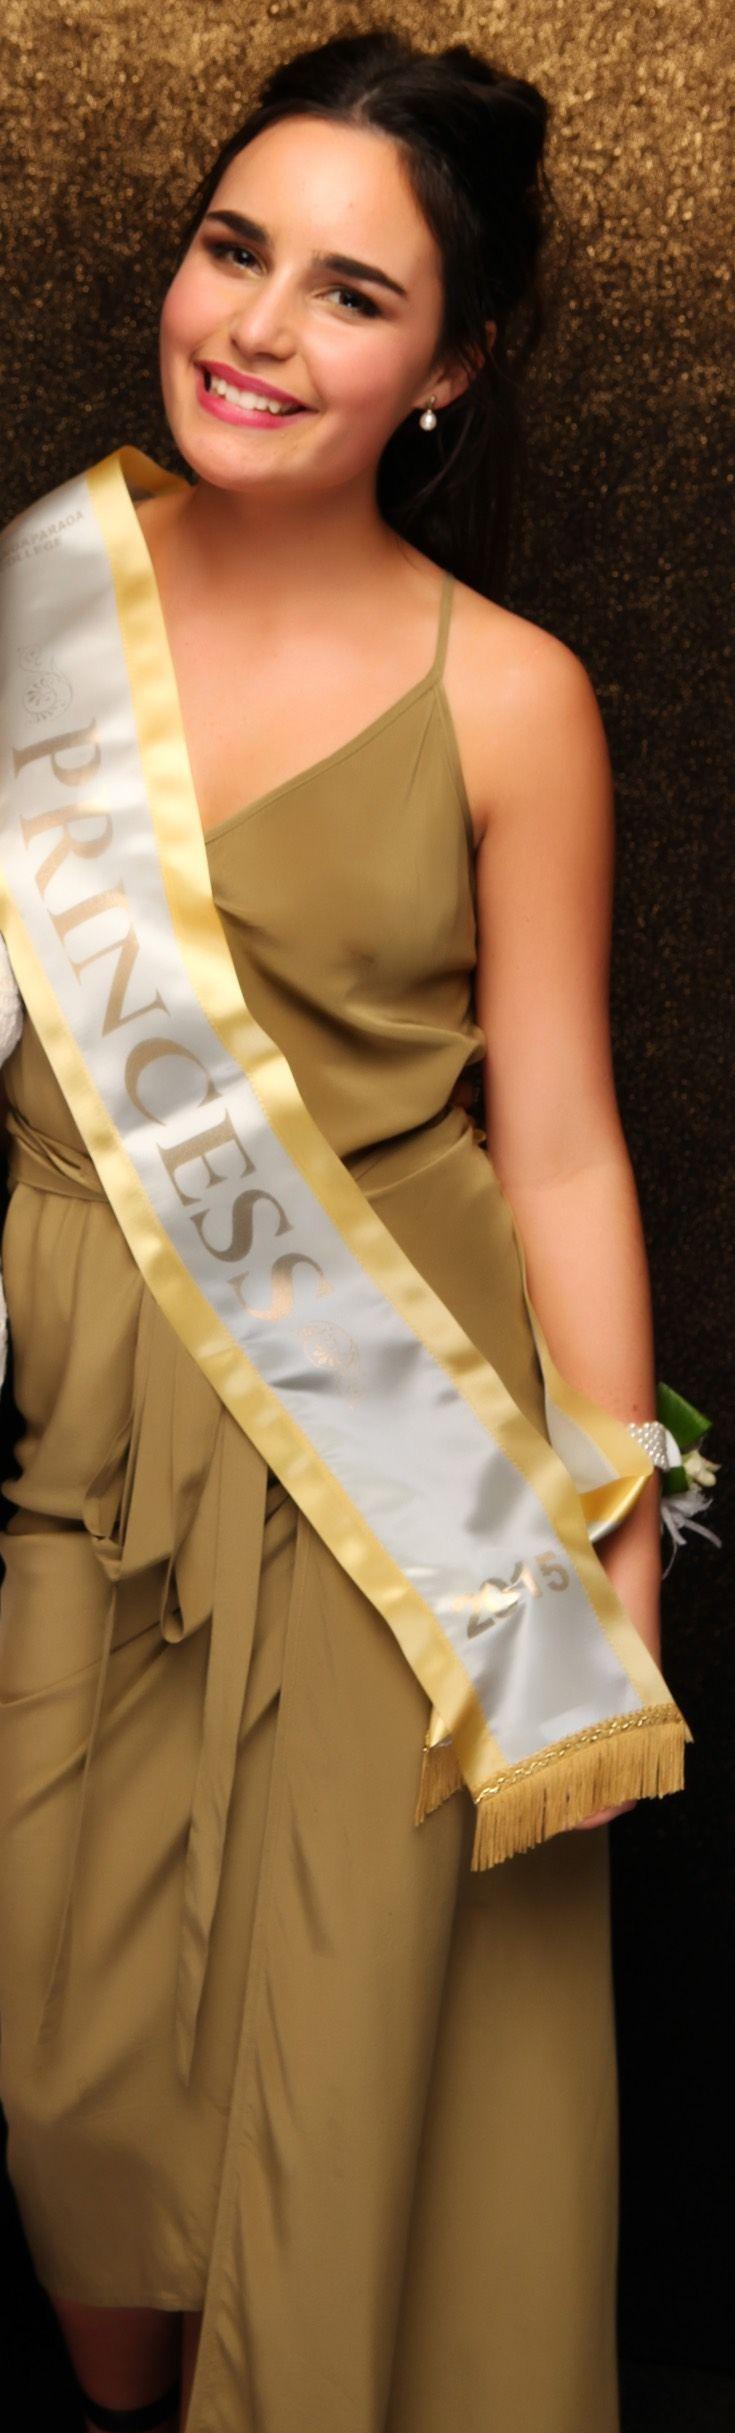 Whangaparaoa Ball 2015. Princess. www.whitedoor.co.nz